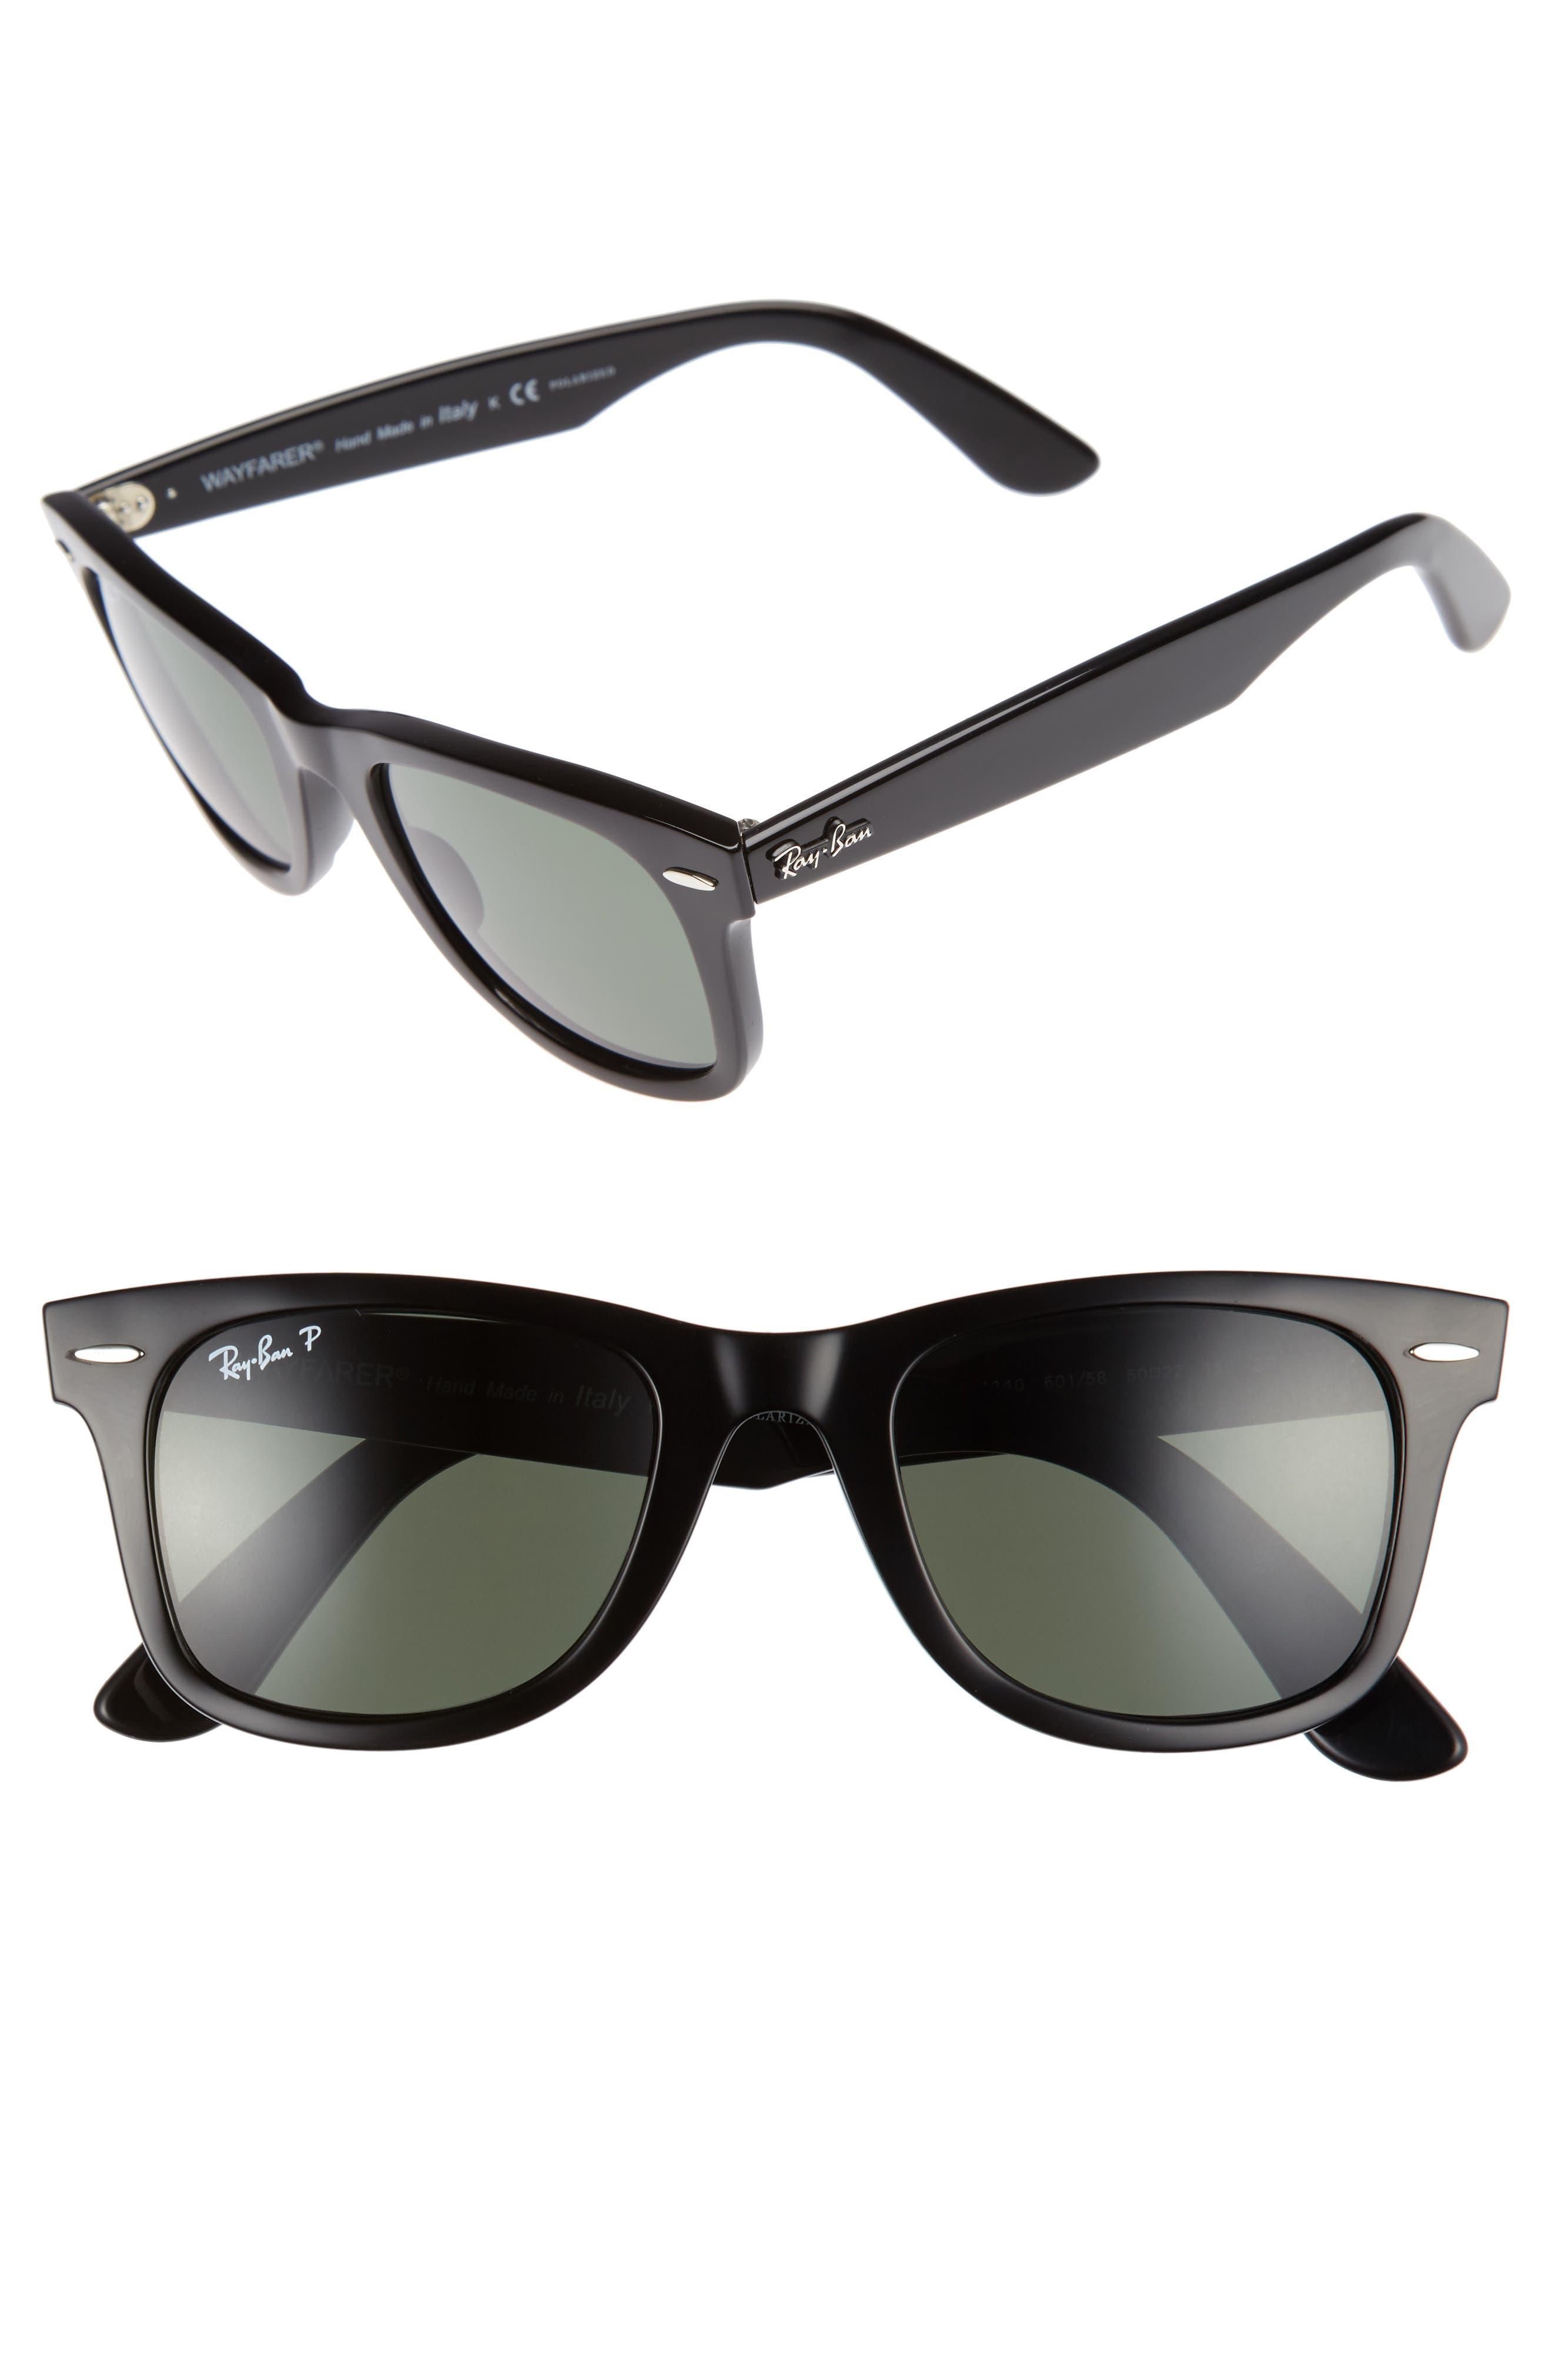 RAY-BAN 50mm Wayfarer Ease Polarized Sunglasses